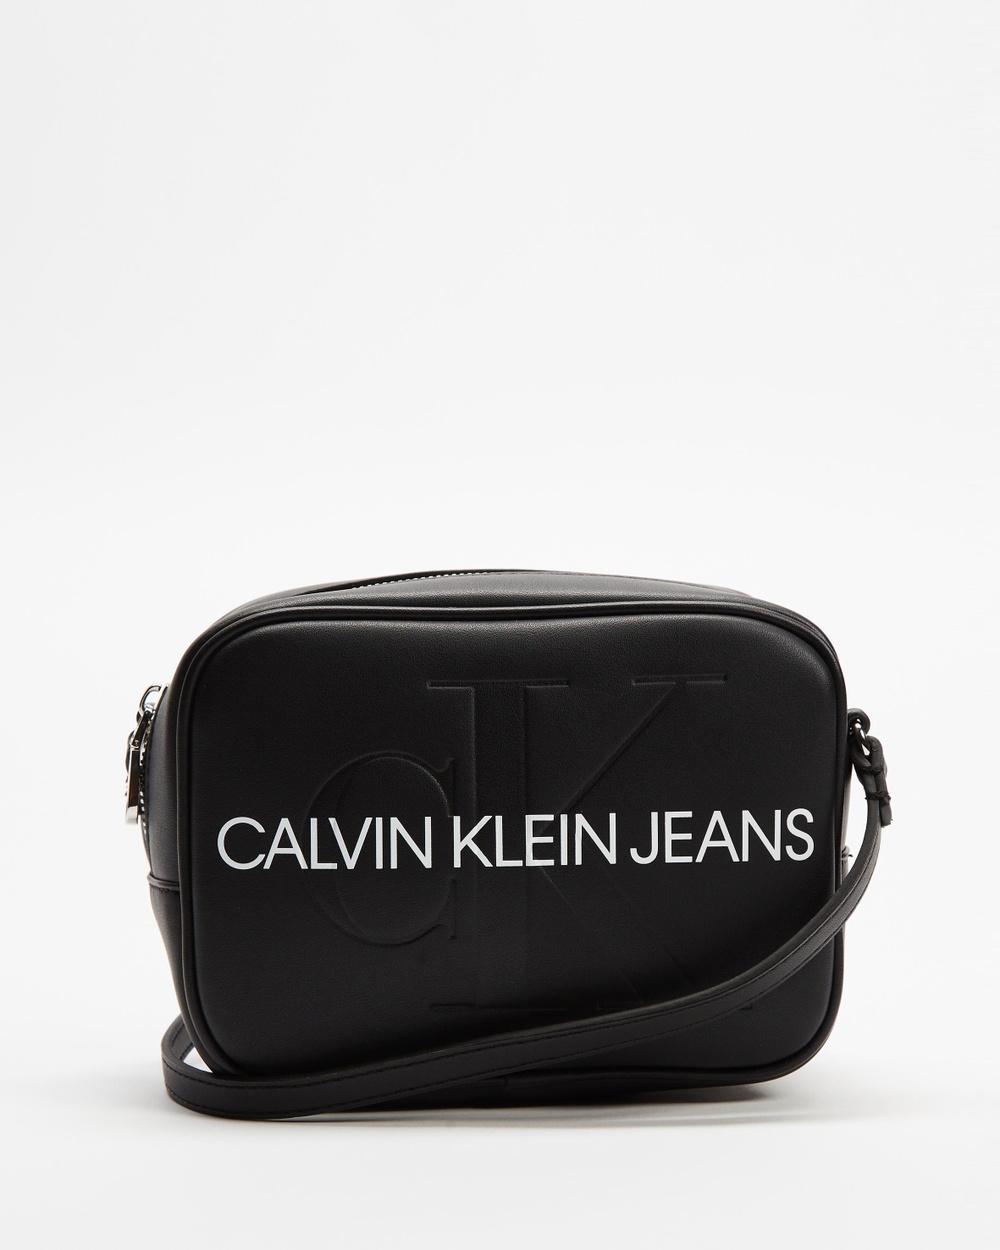 Calvin Klein Jeans Branded Cross Body Camera Bag Bags Black Cross-Body